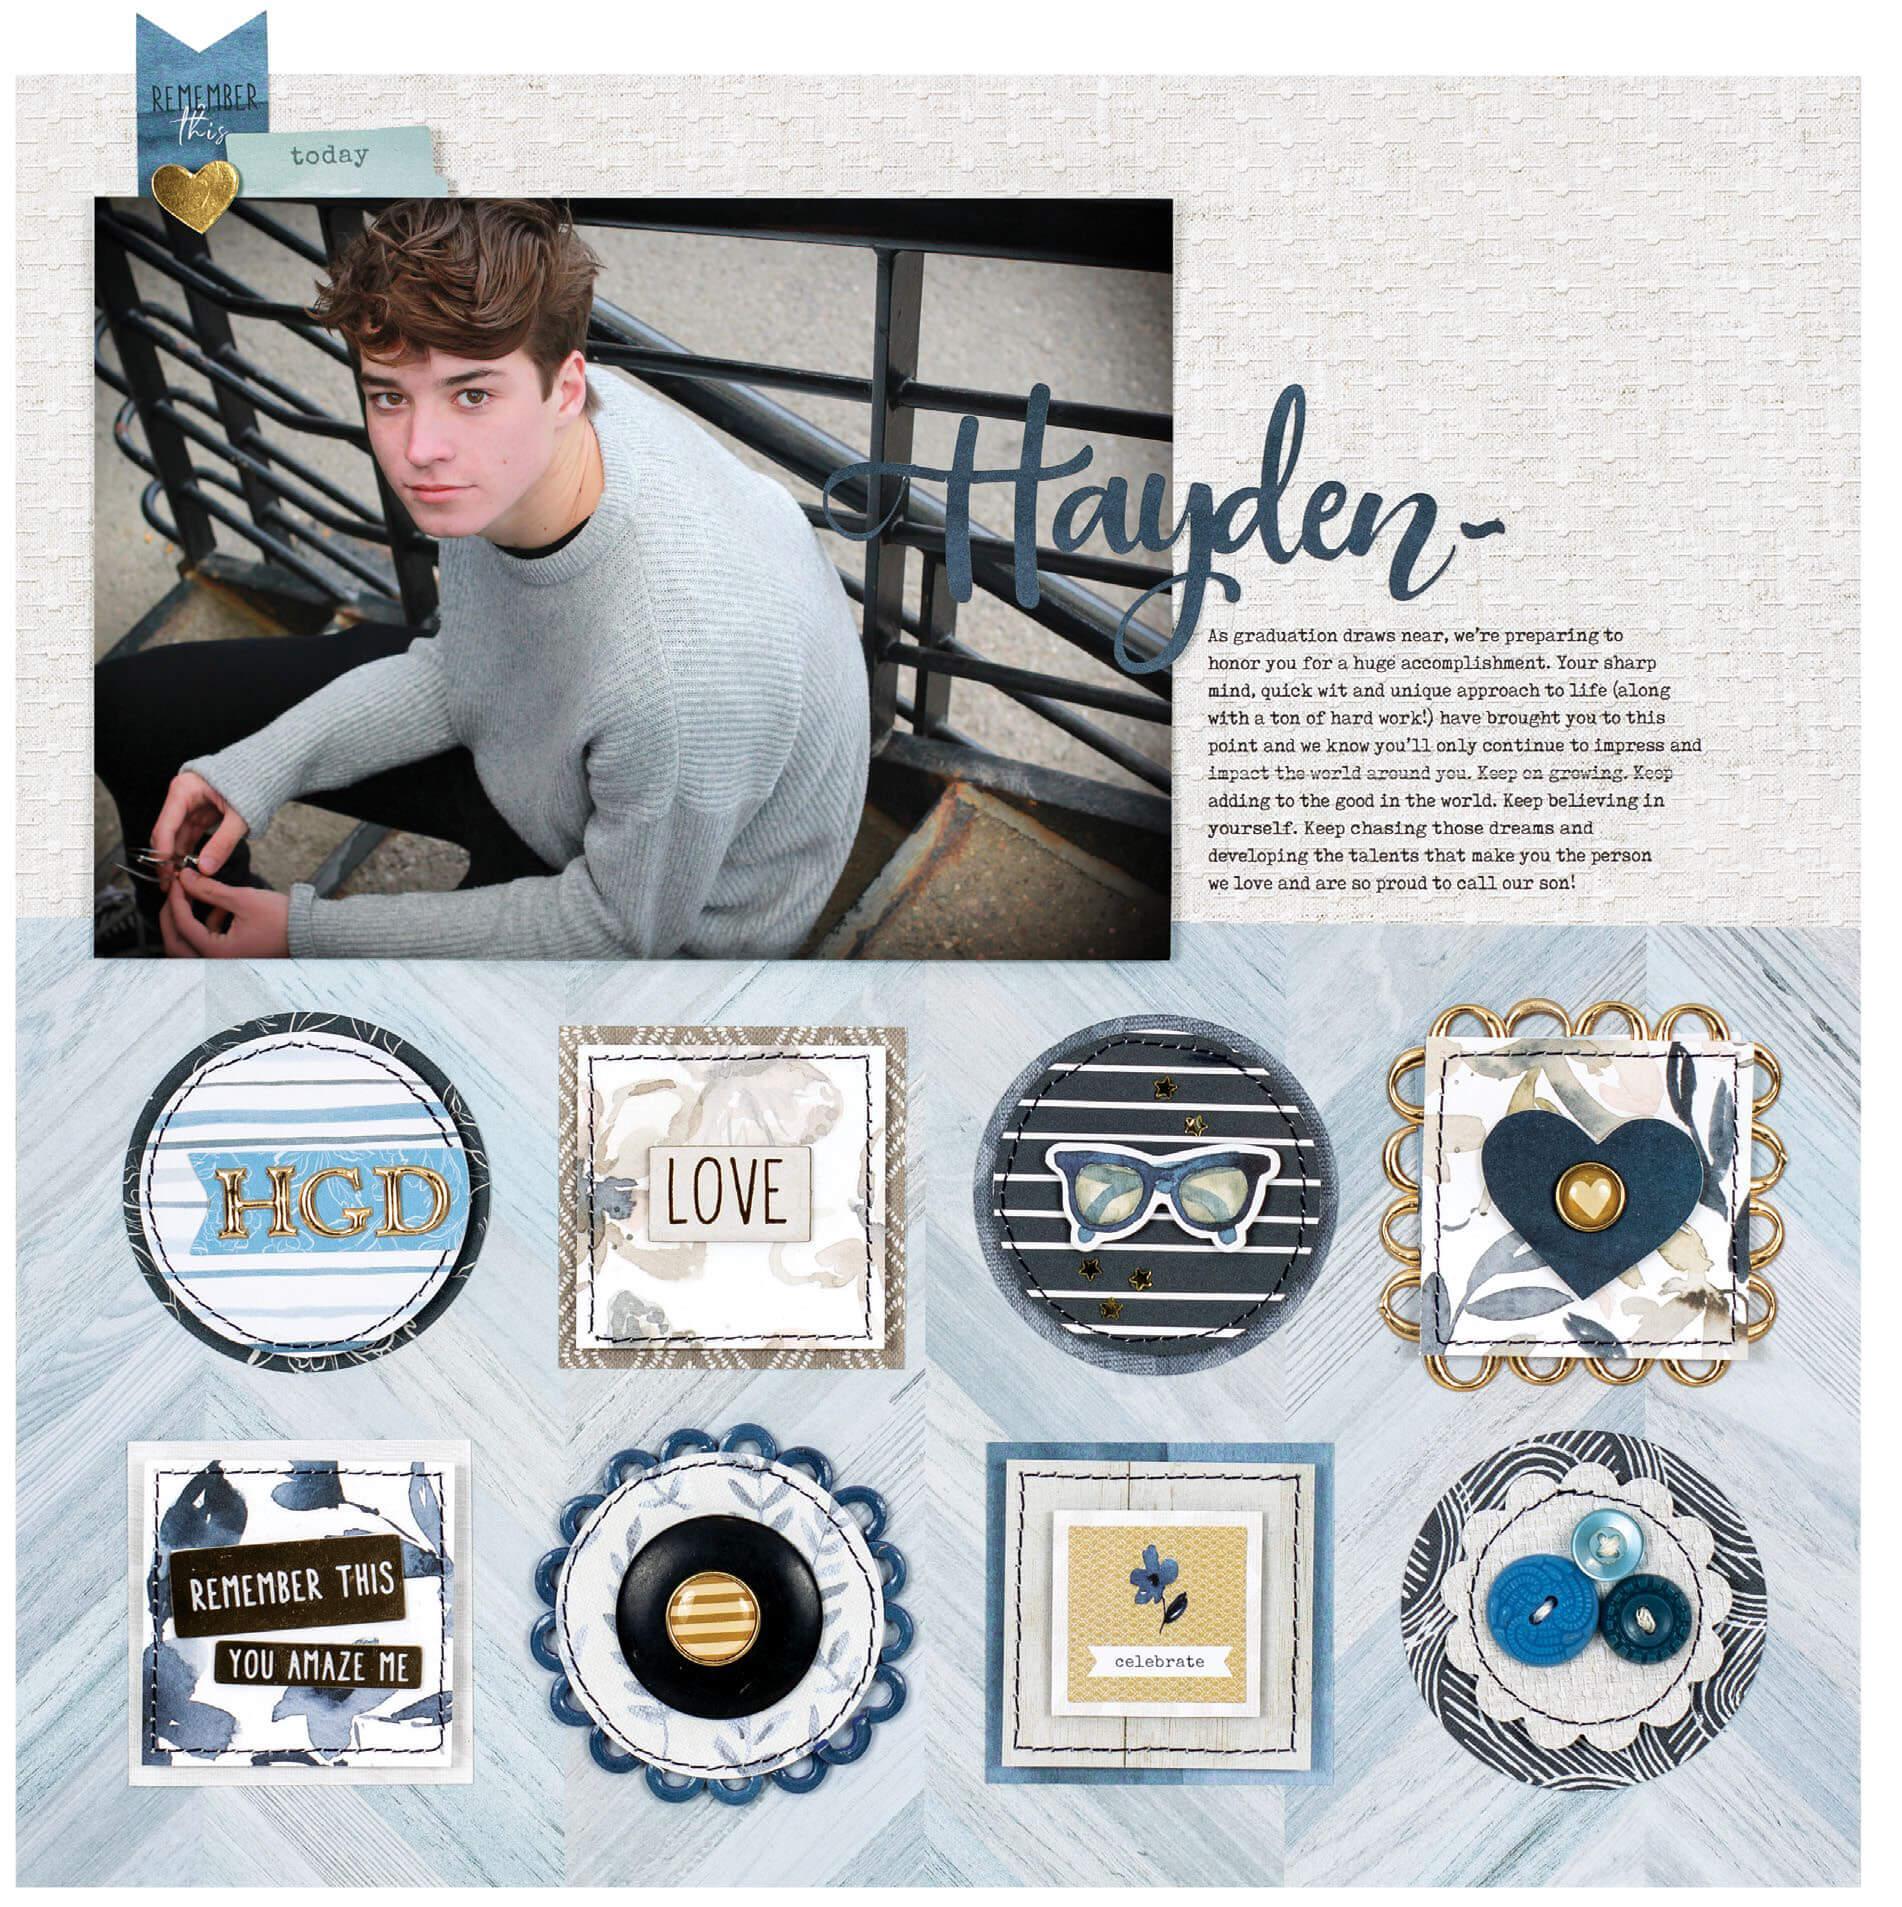 Scrapbook & Cards Today - Summer 2019 - Hayden layout by Lisa Dickinson